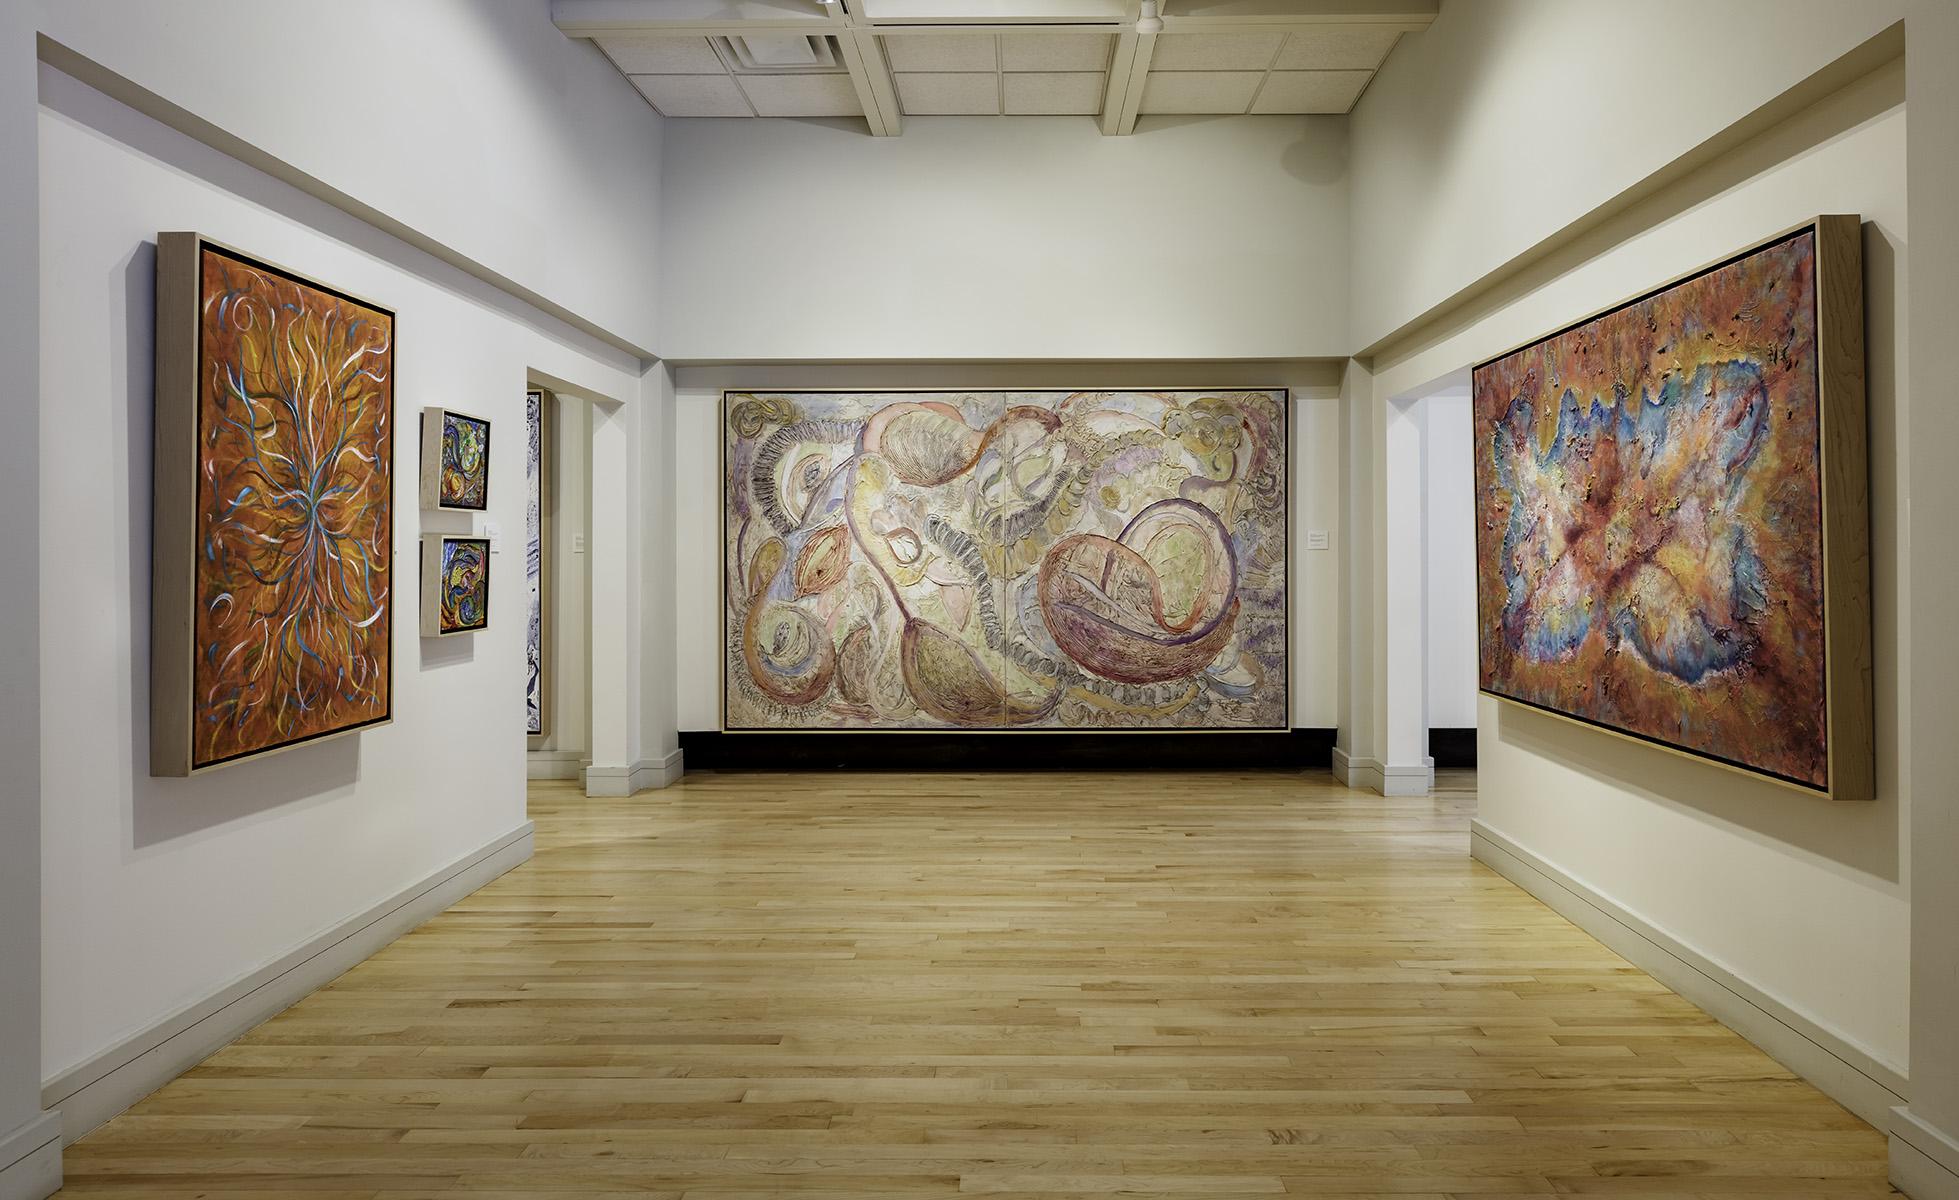 20190318_CoralSpringsMuseum_Krutick_F009 web.jpg